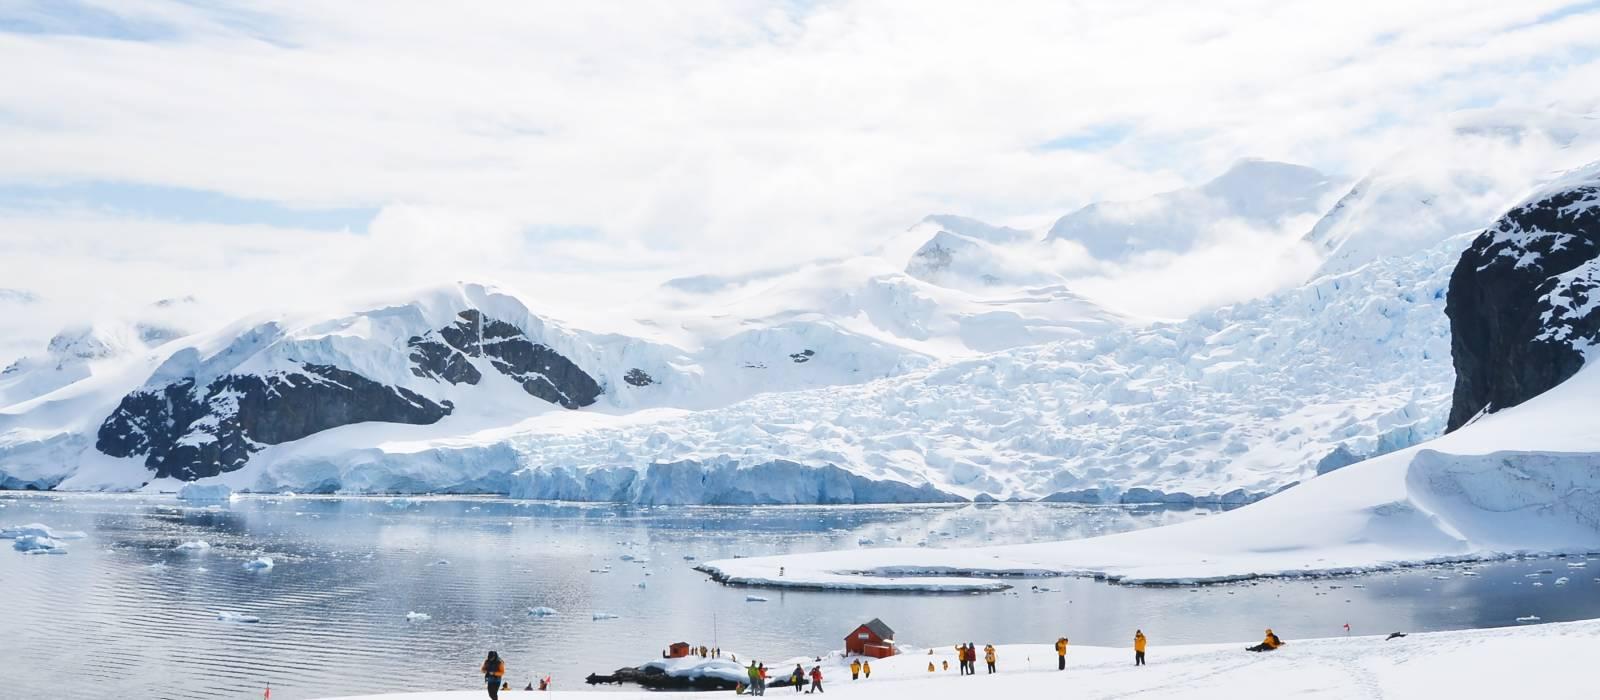 Expidition to Antarctica